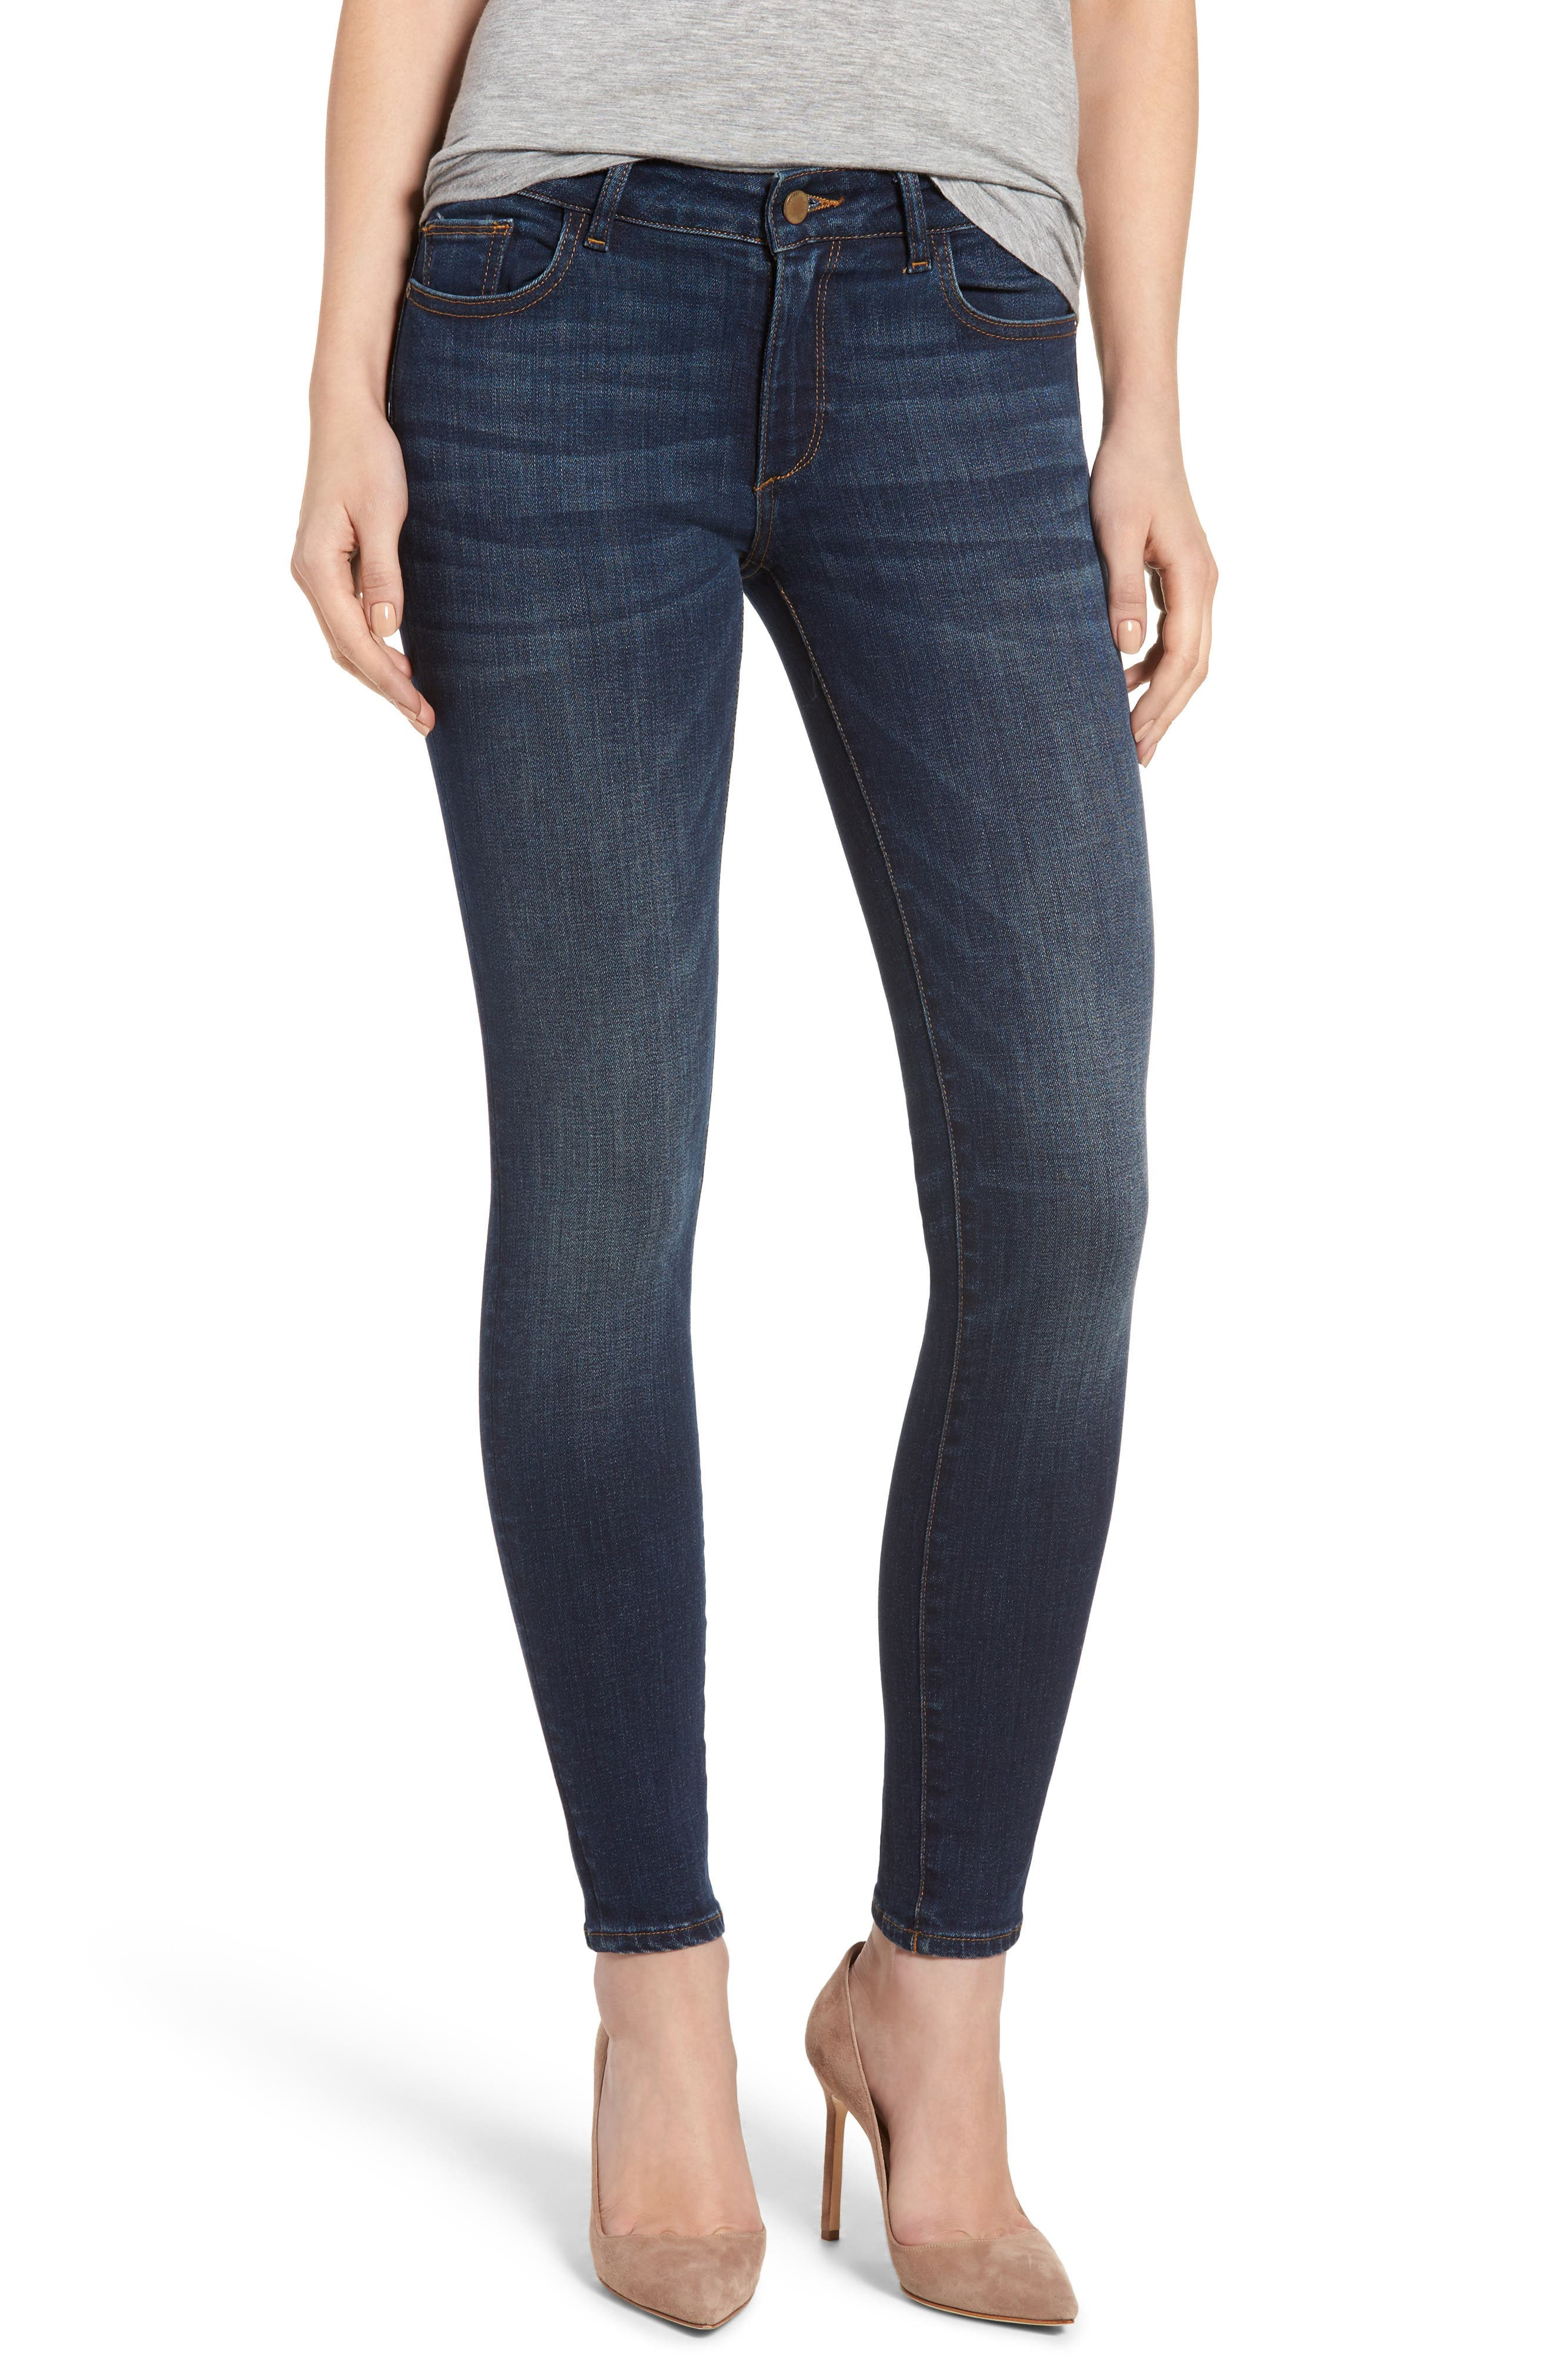 Main Image - DL1961 Emma Power Legging Skinny Jeans (Sulton)